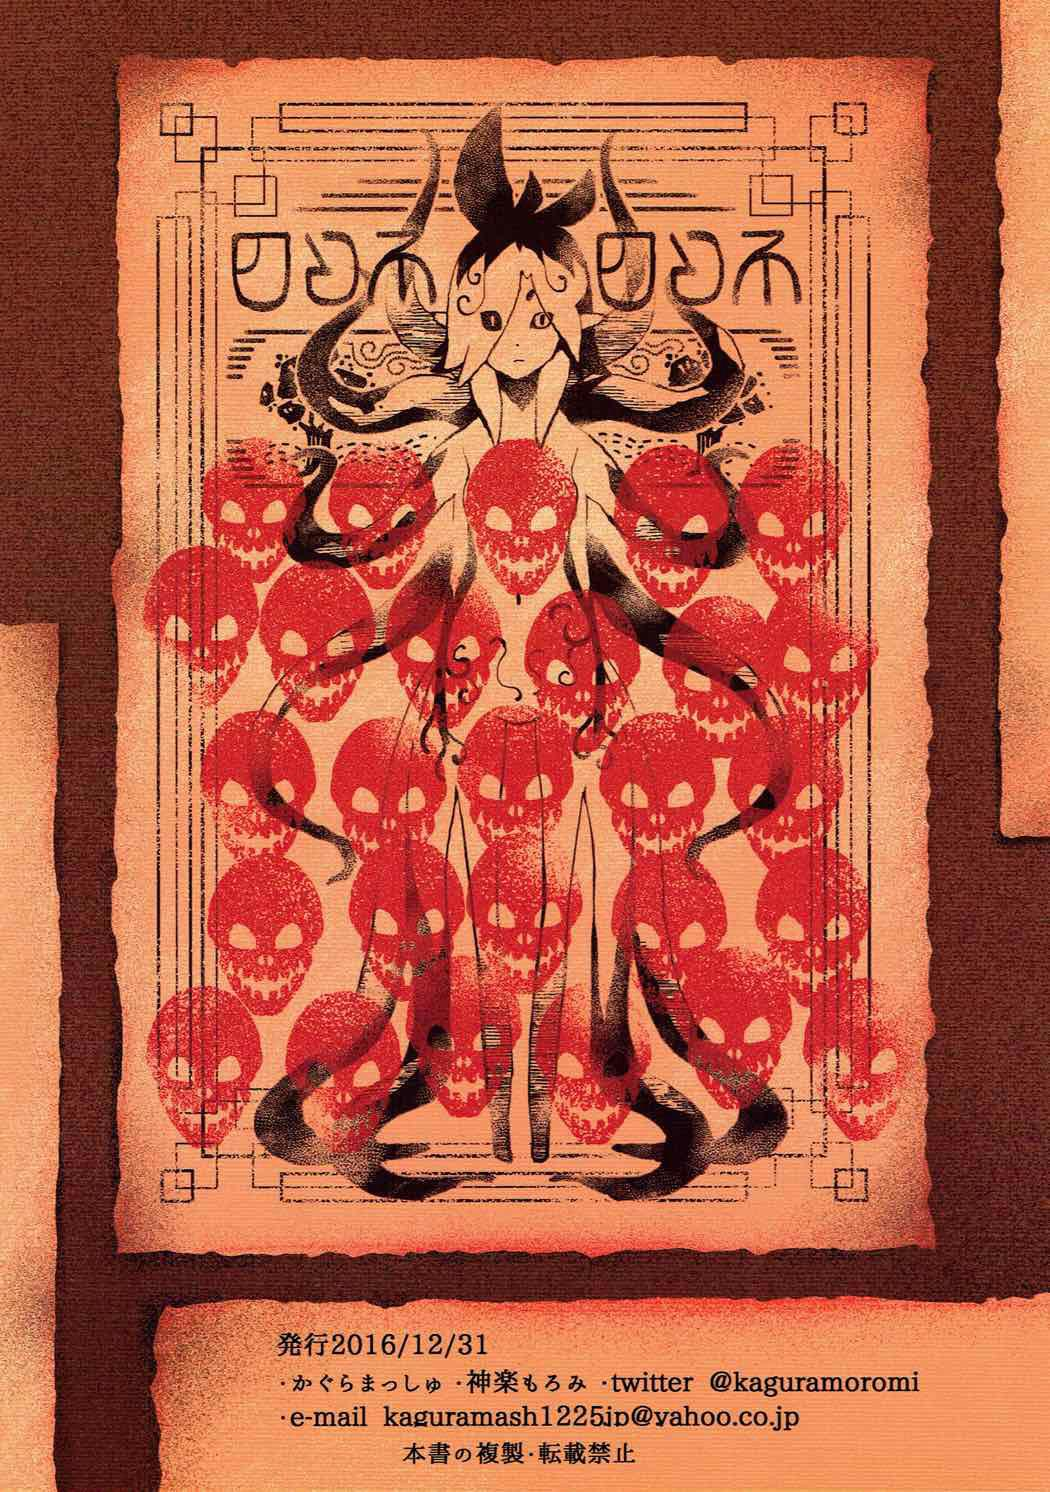 Kono Megami o Uneune Okasu Usui Hon | A thin book where this goddess gets ravished sinuously 25